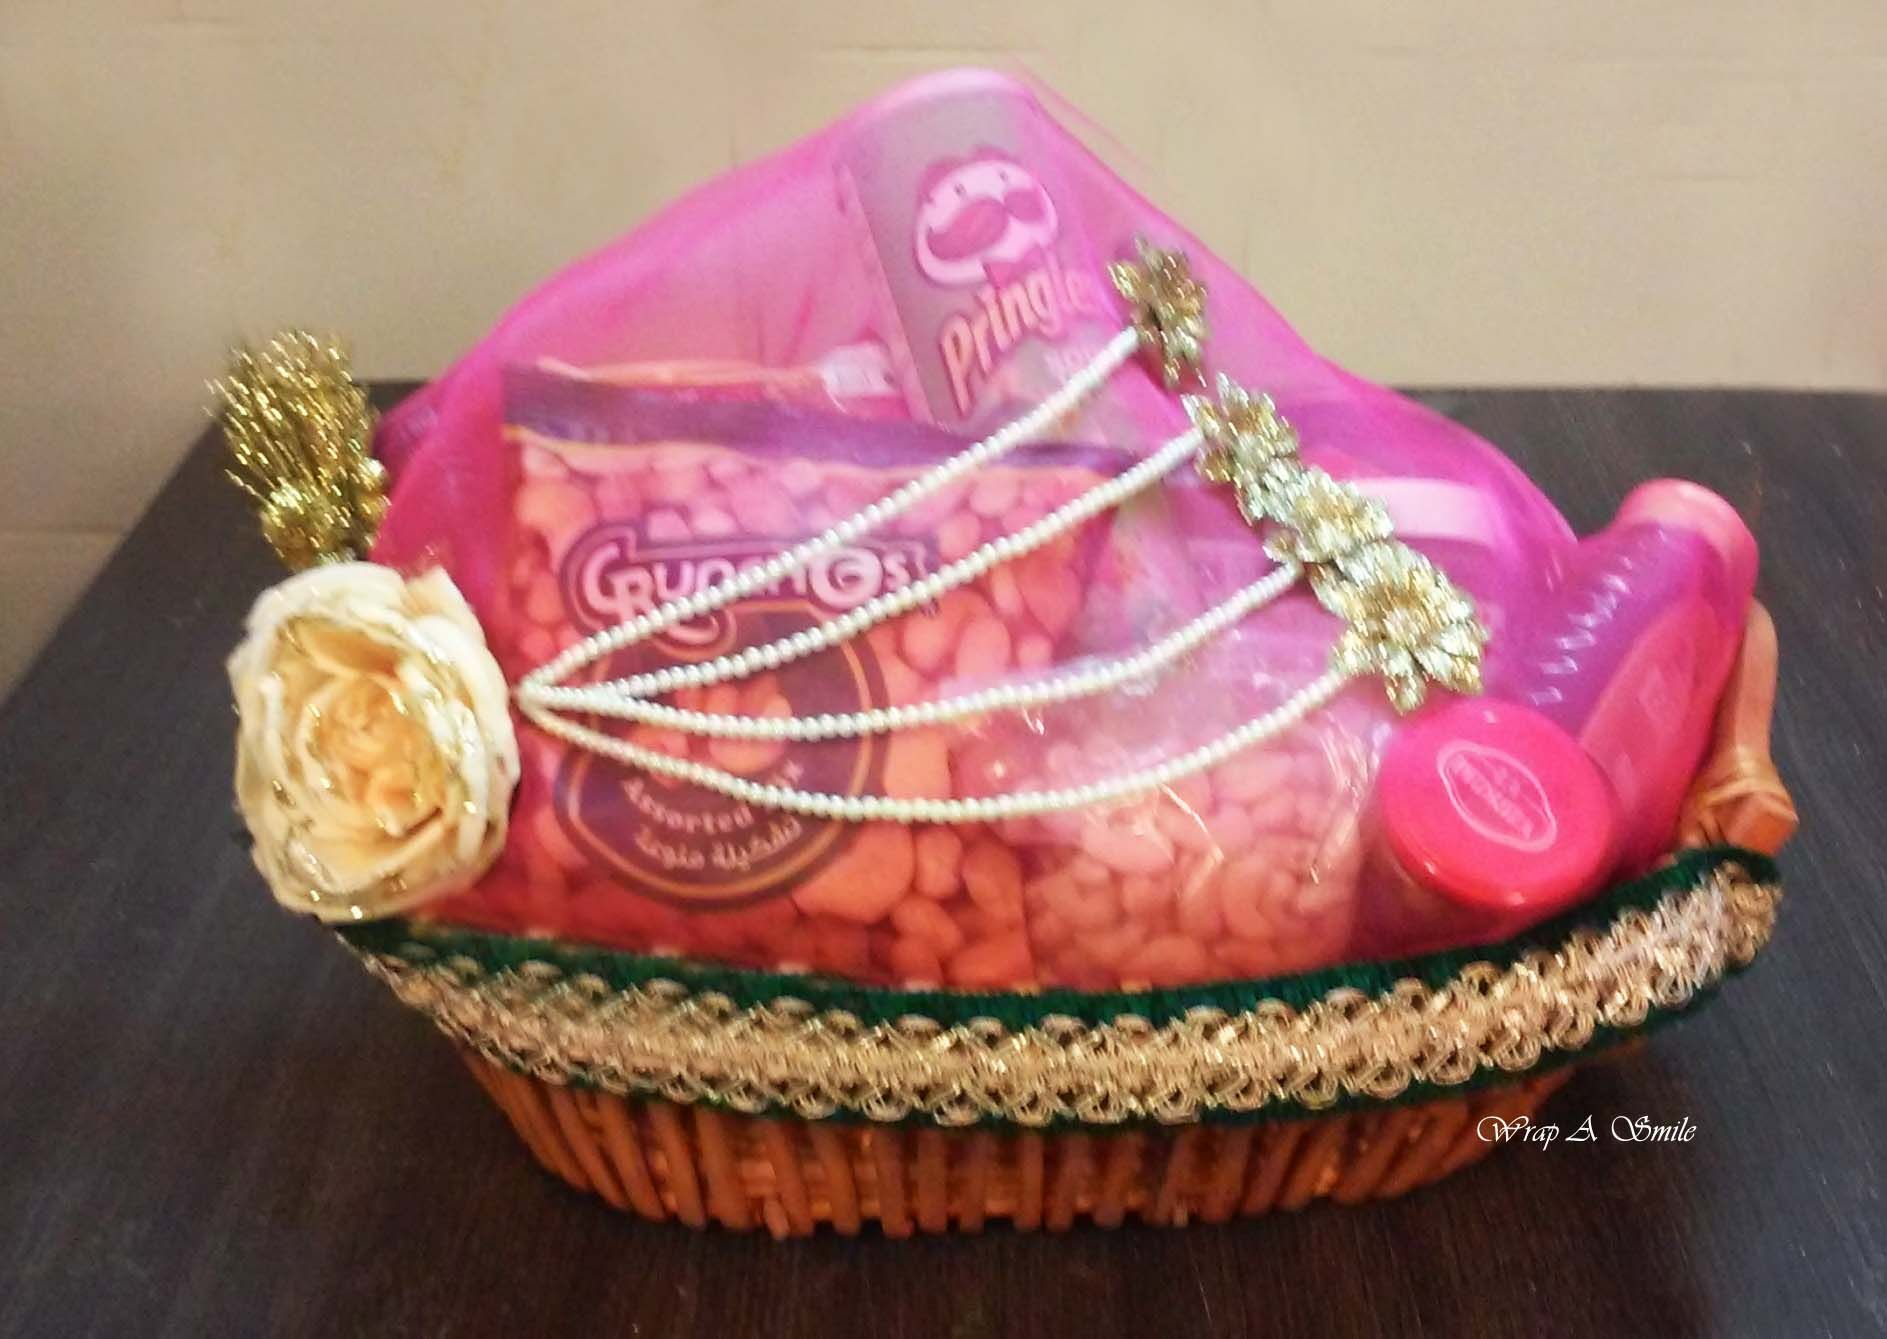 Shagun Wedding Hamper Baskets designed At Wrap A Smile - By Shreya ...